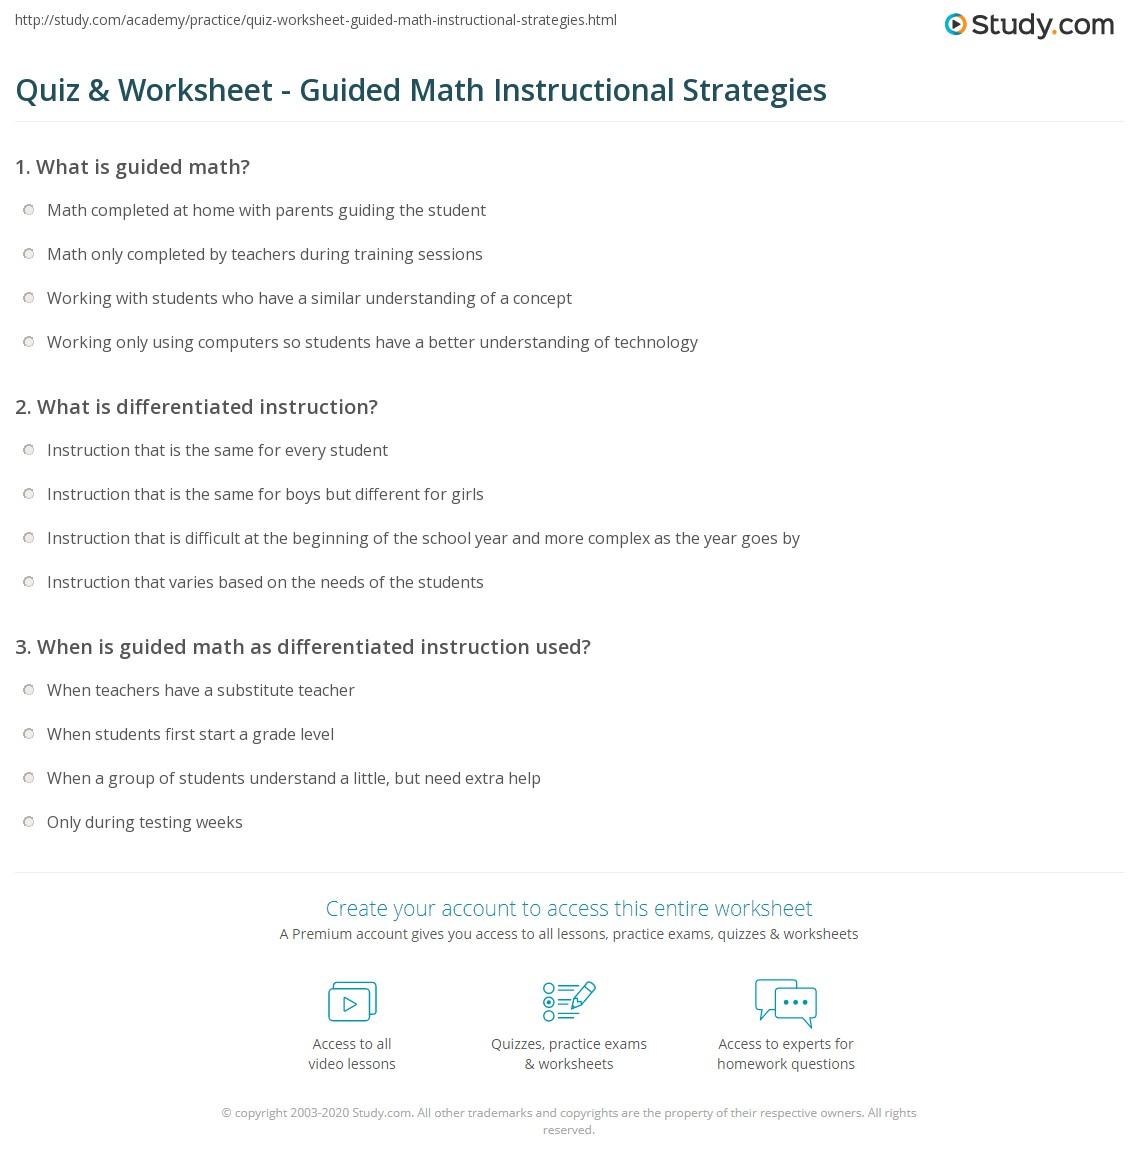 Quiz Worksheet Guided Math Instructional Strategies Study